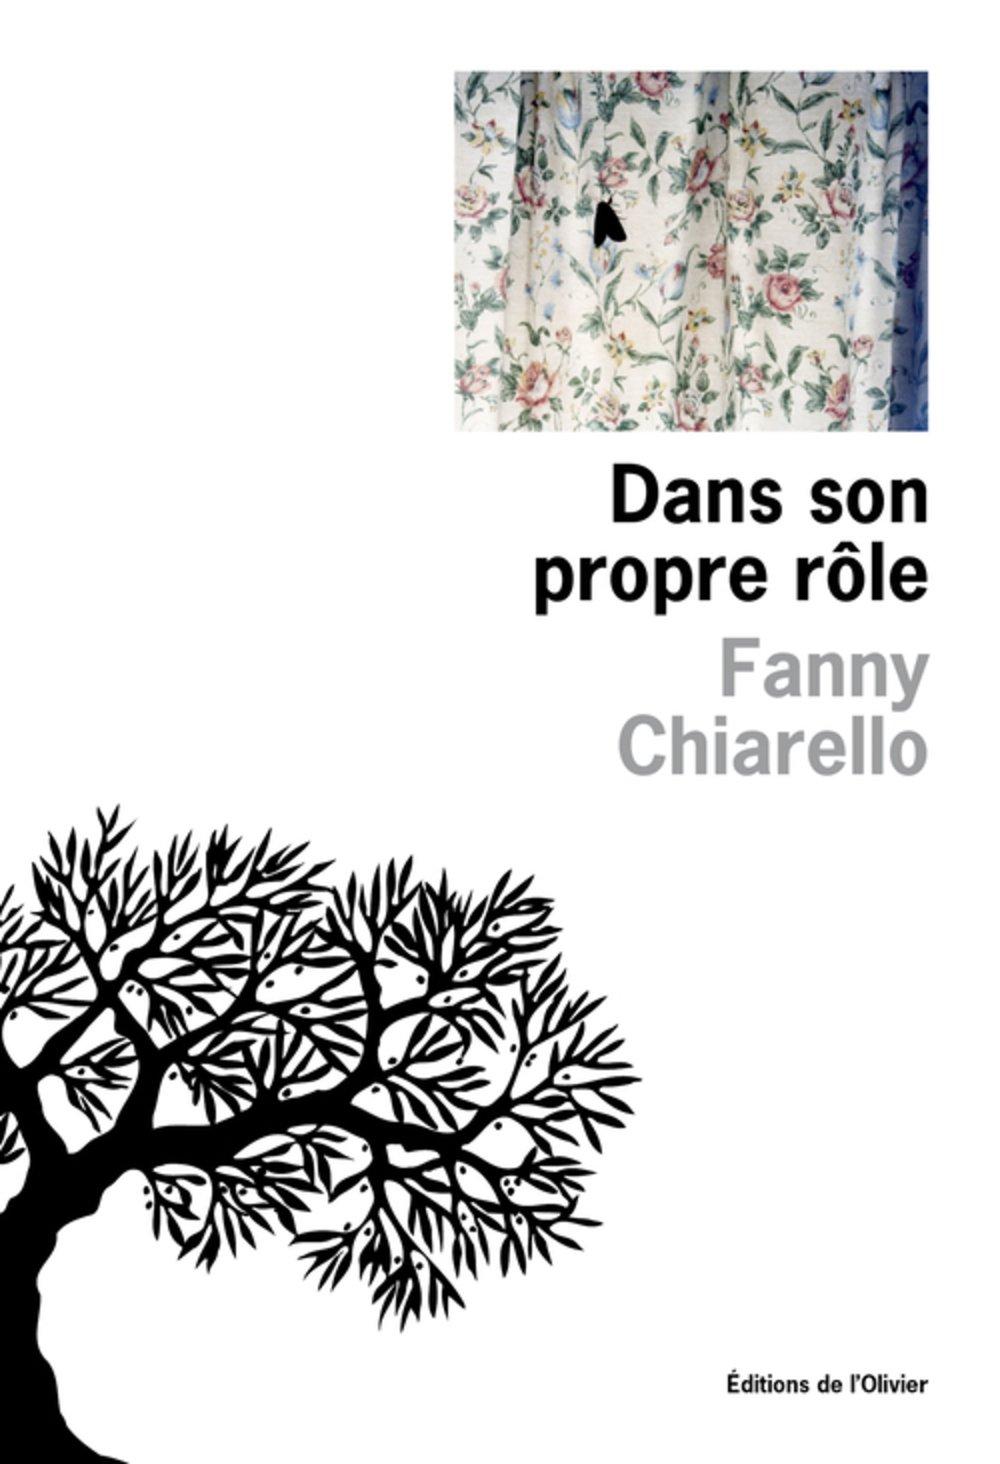 Dans son propre rôle de Fanny Chiarello  71bTaO2DsJL